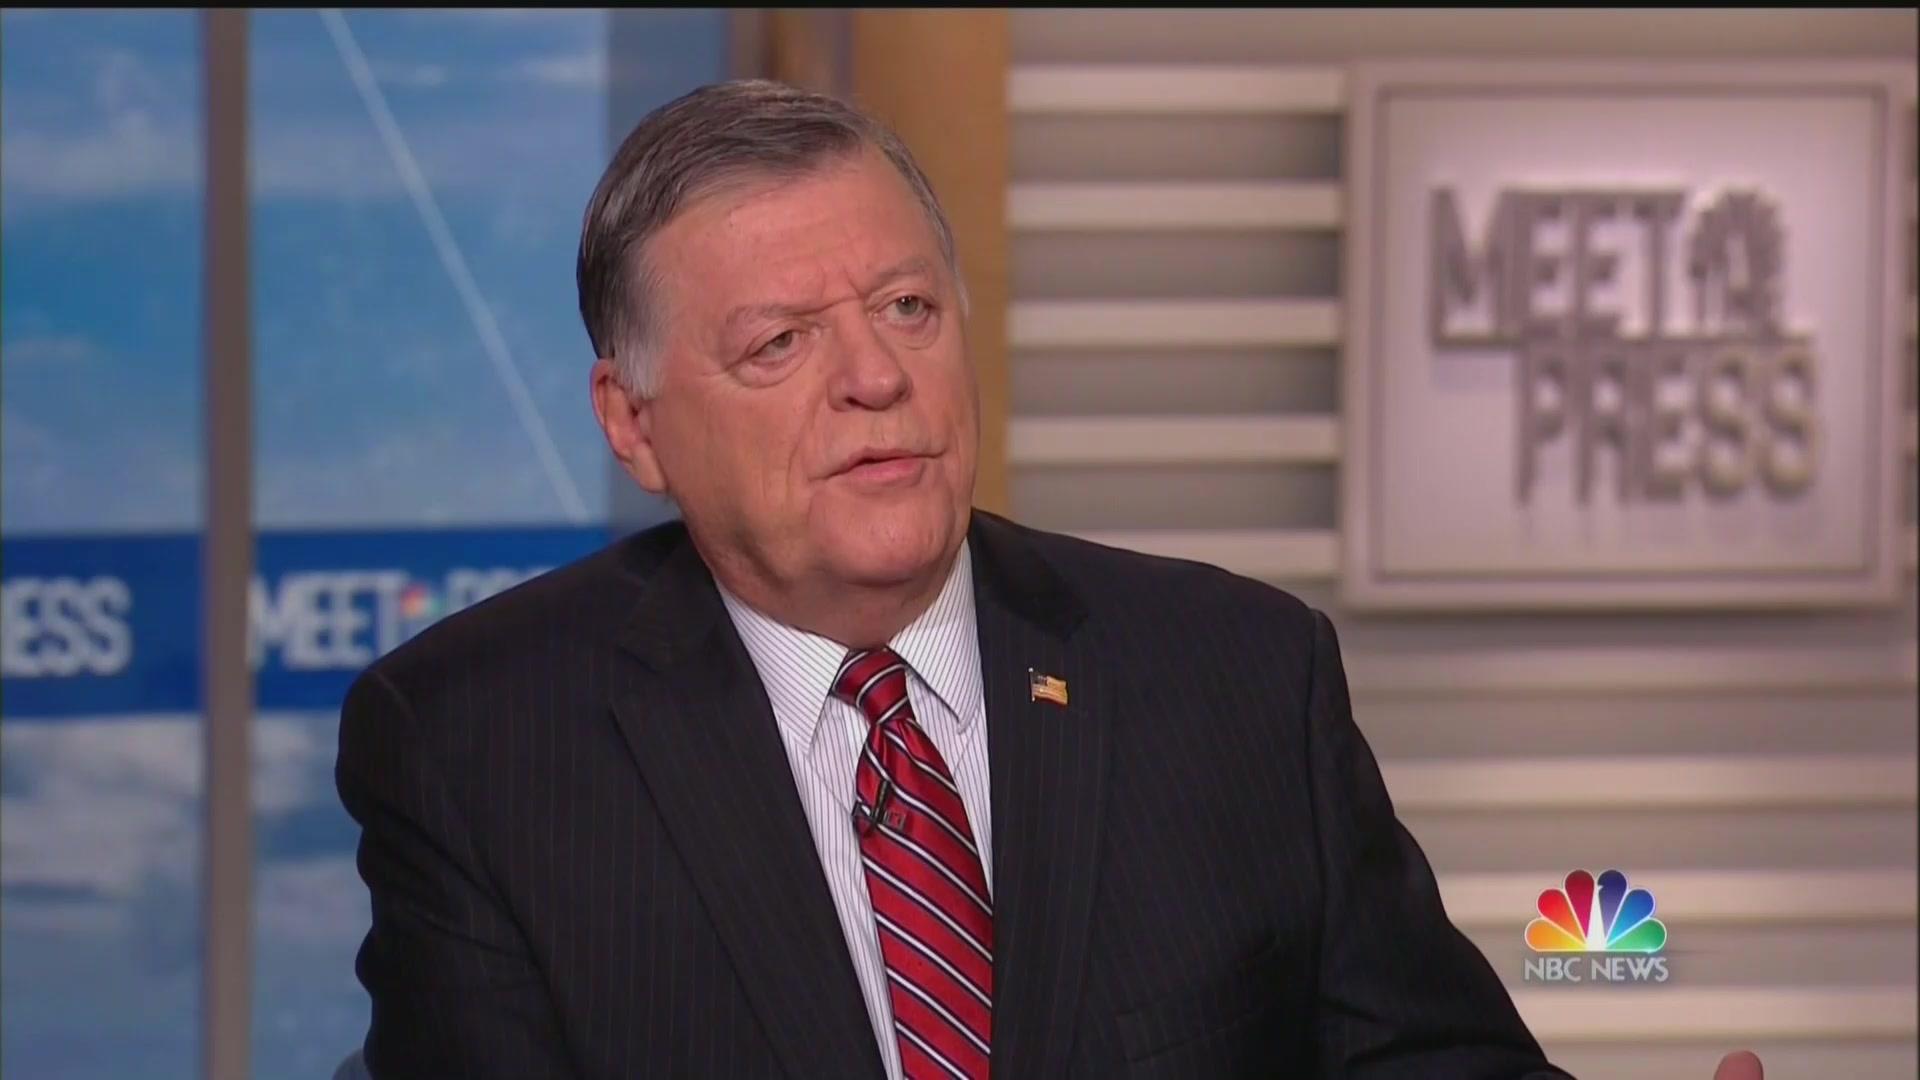 GOP Congressman: I Haven't 'Closed the Door' on Impeachment